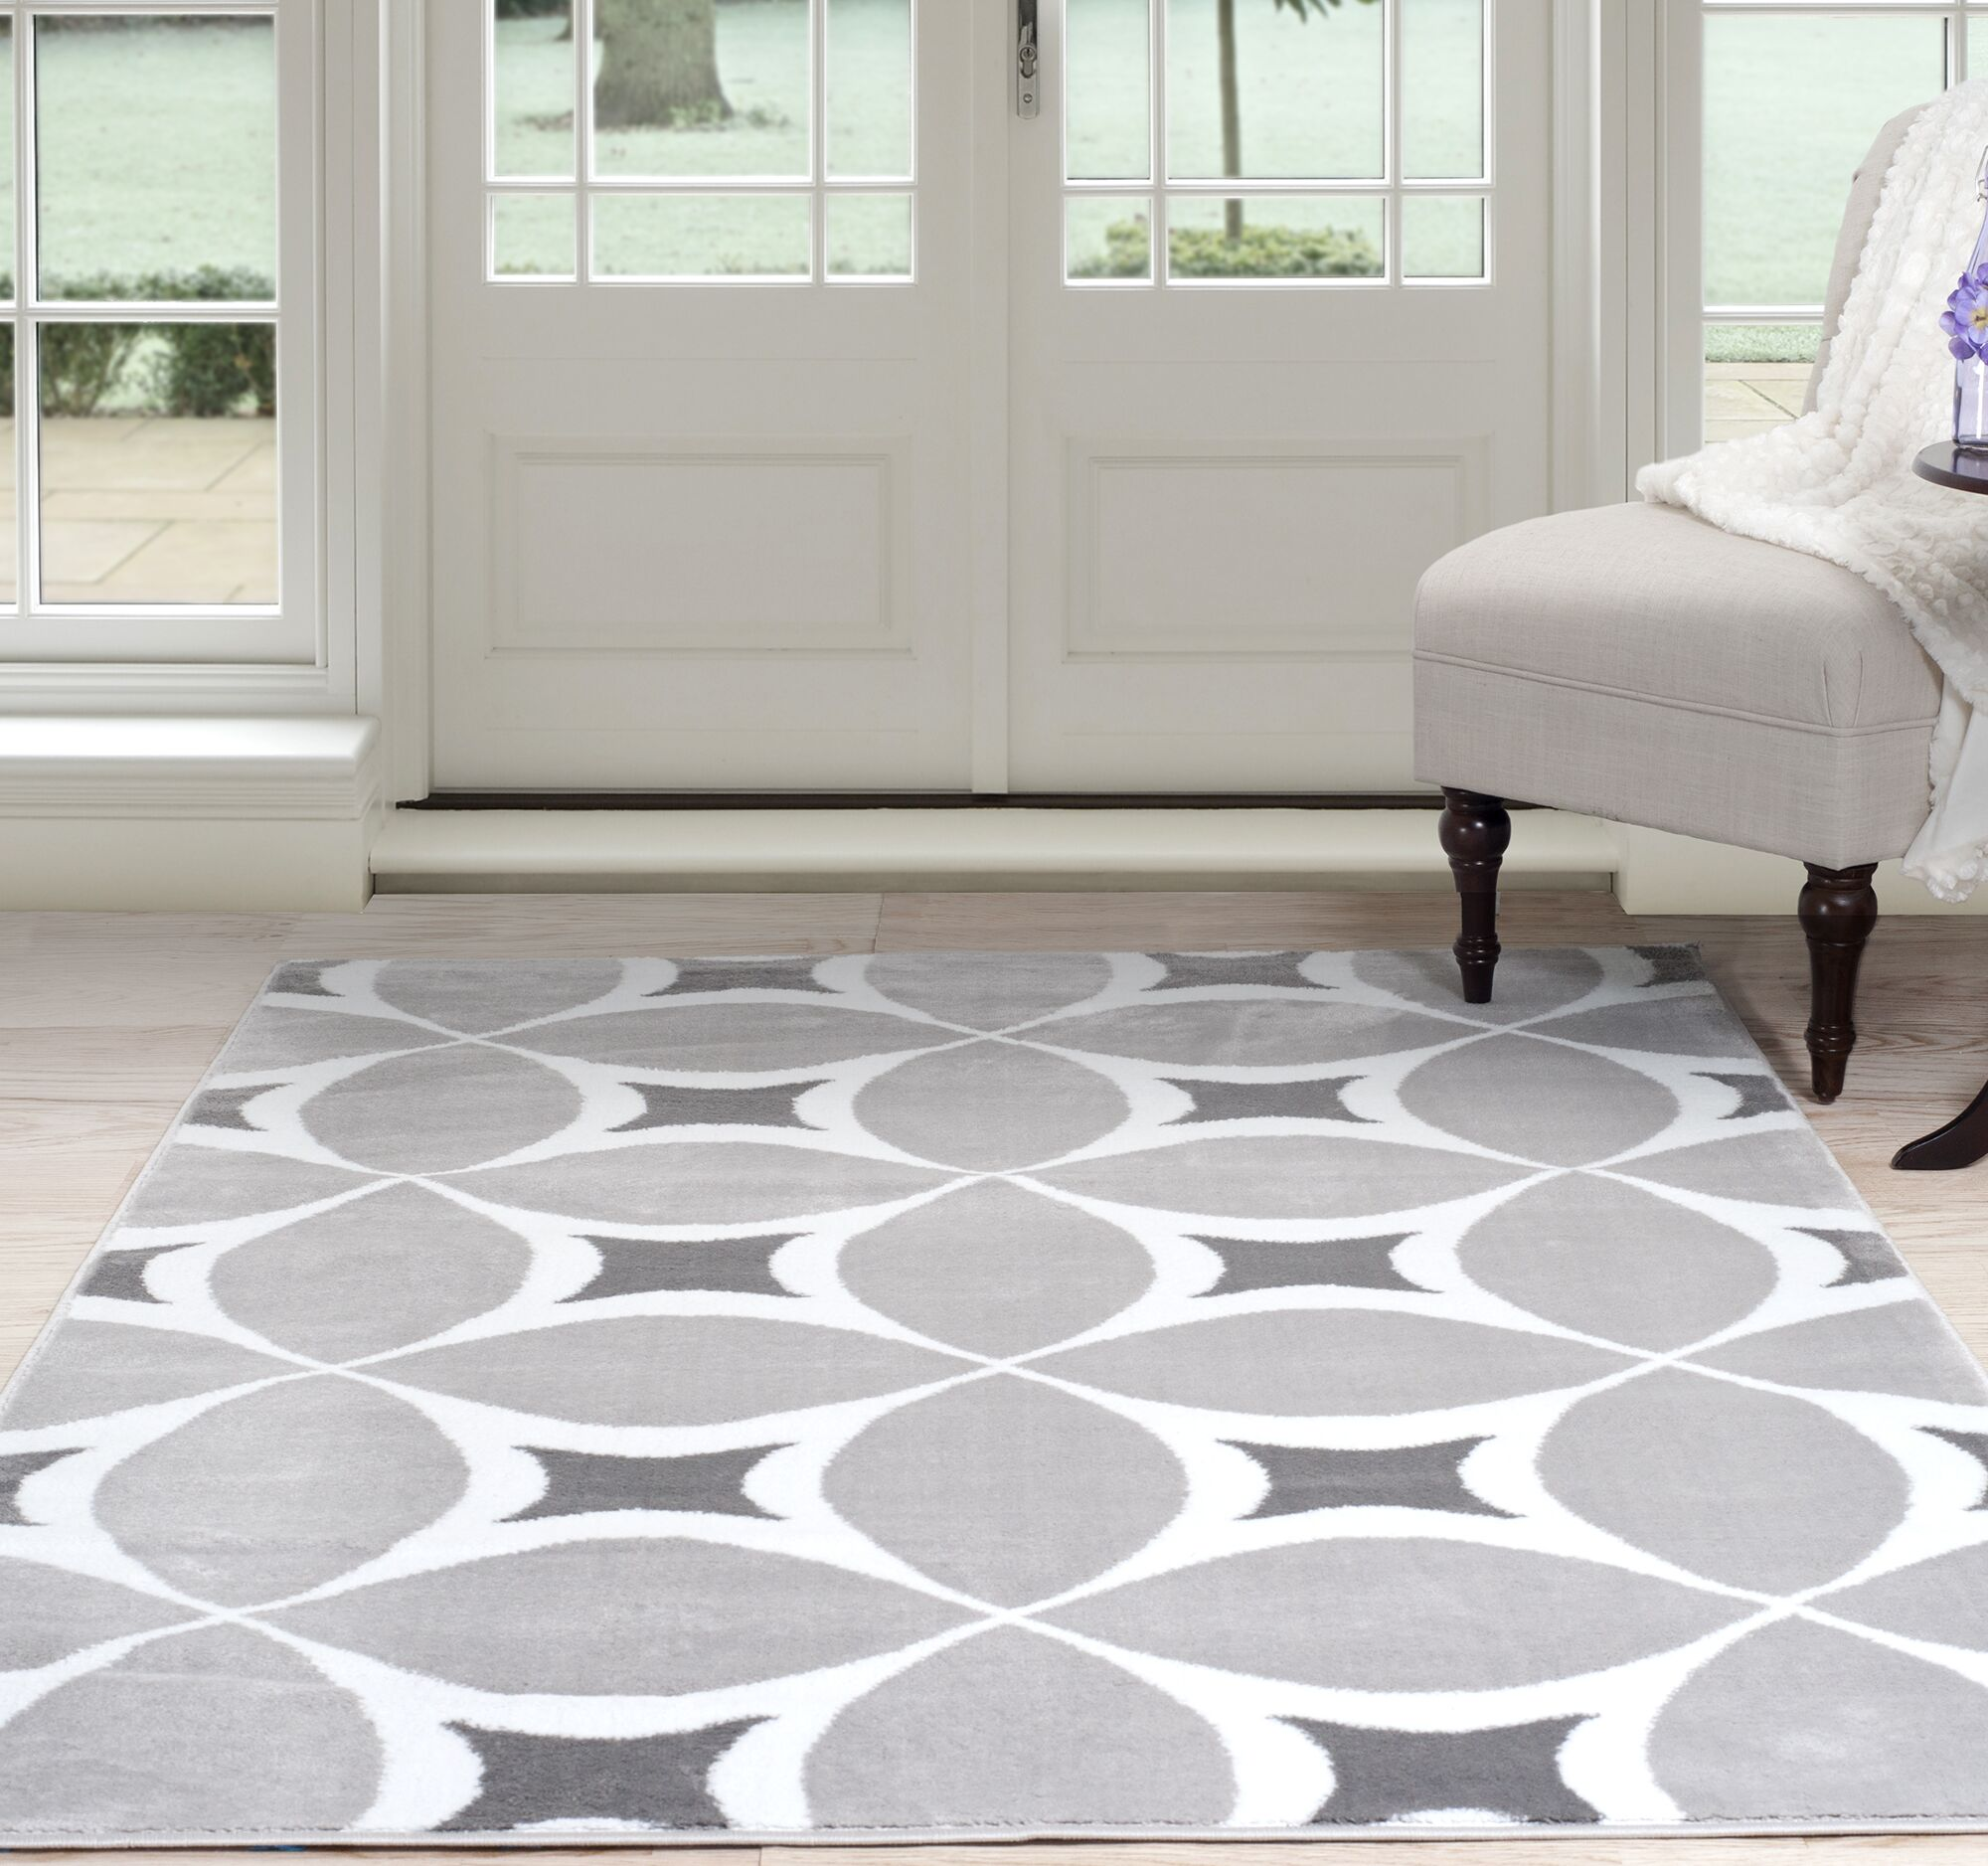 Geometric Gray Area Rug Rug Size: Rectangle 5' x 7'7